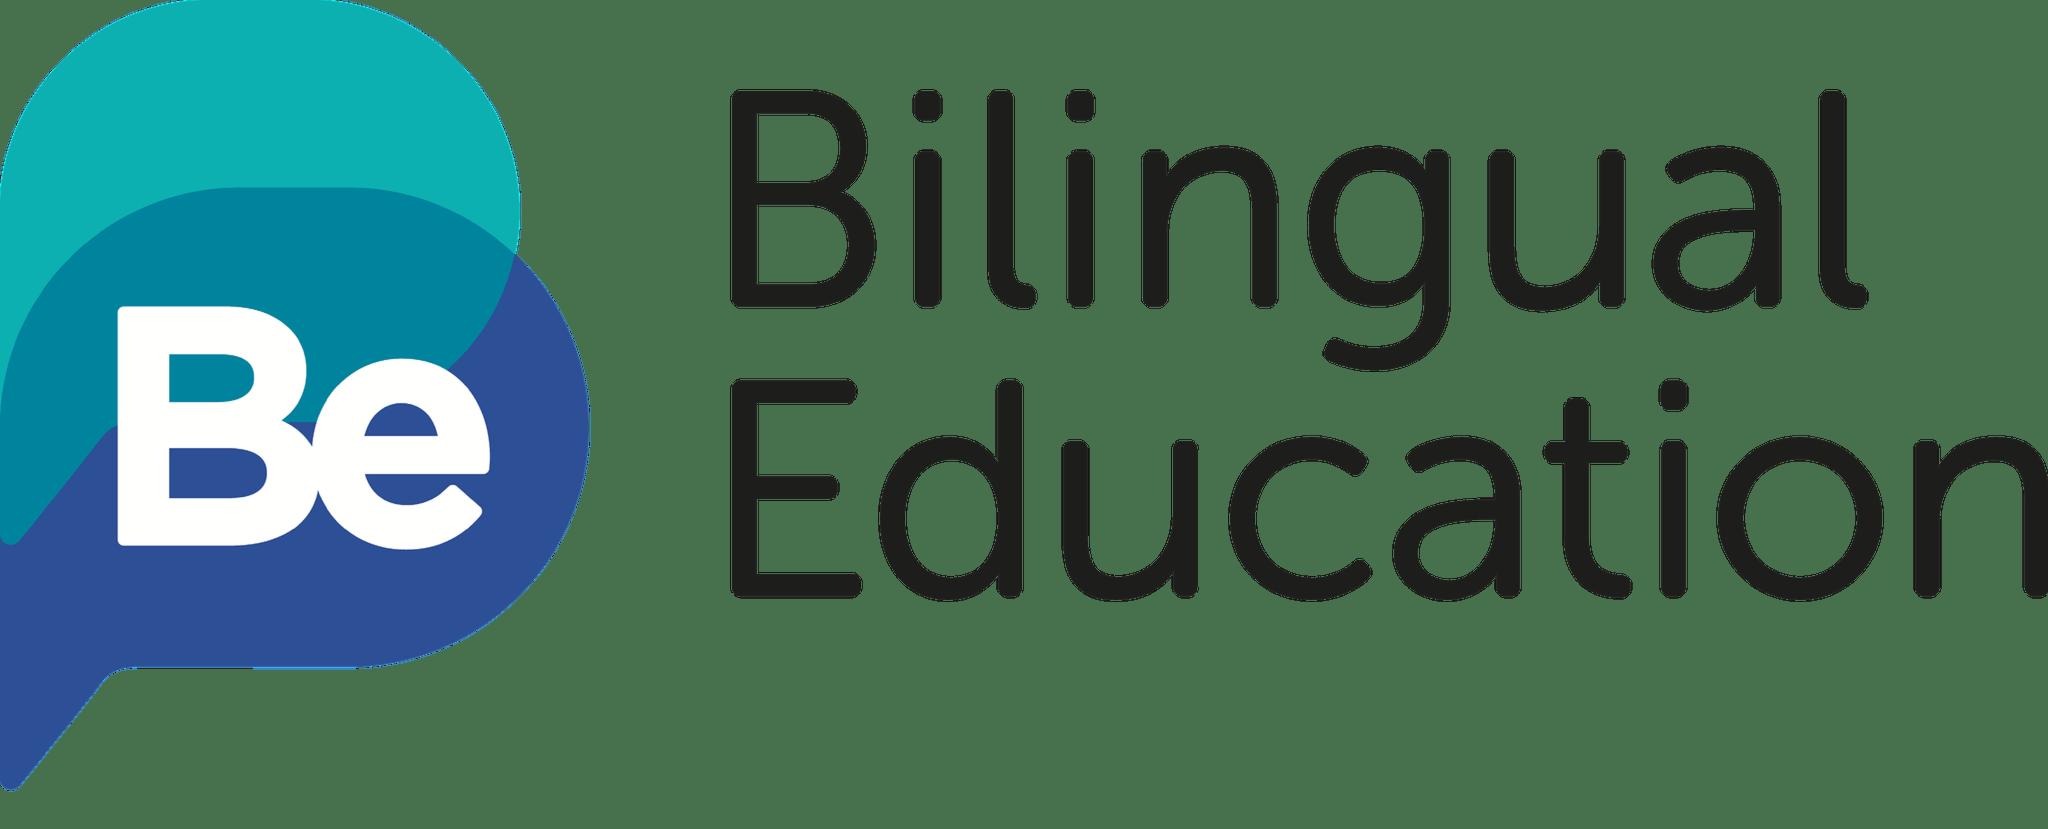 Be - Bilingual Education